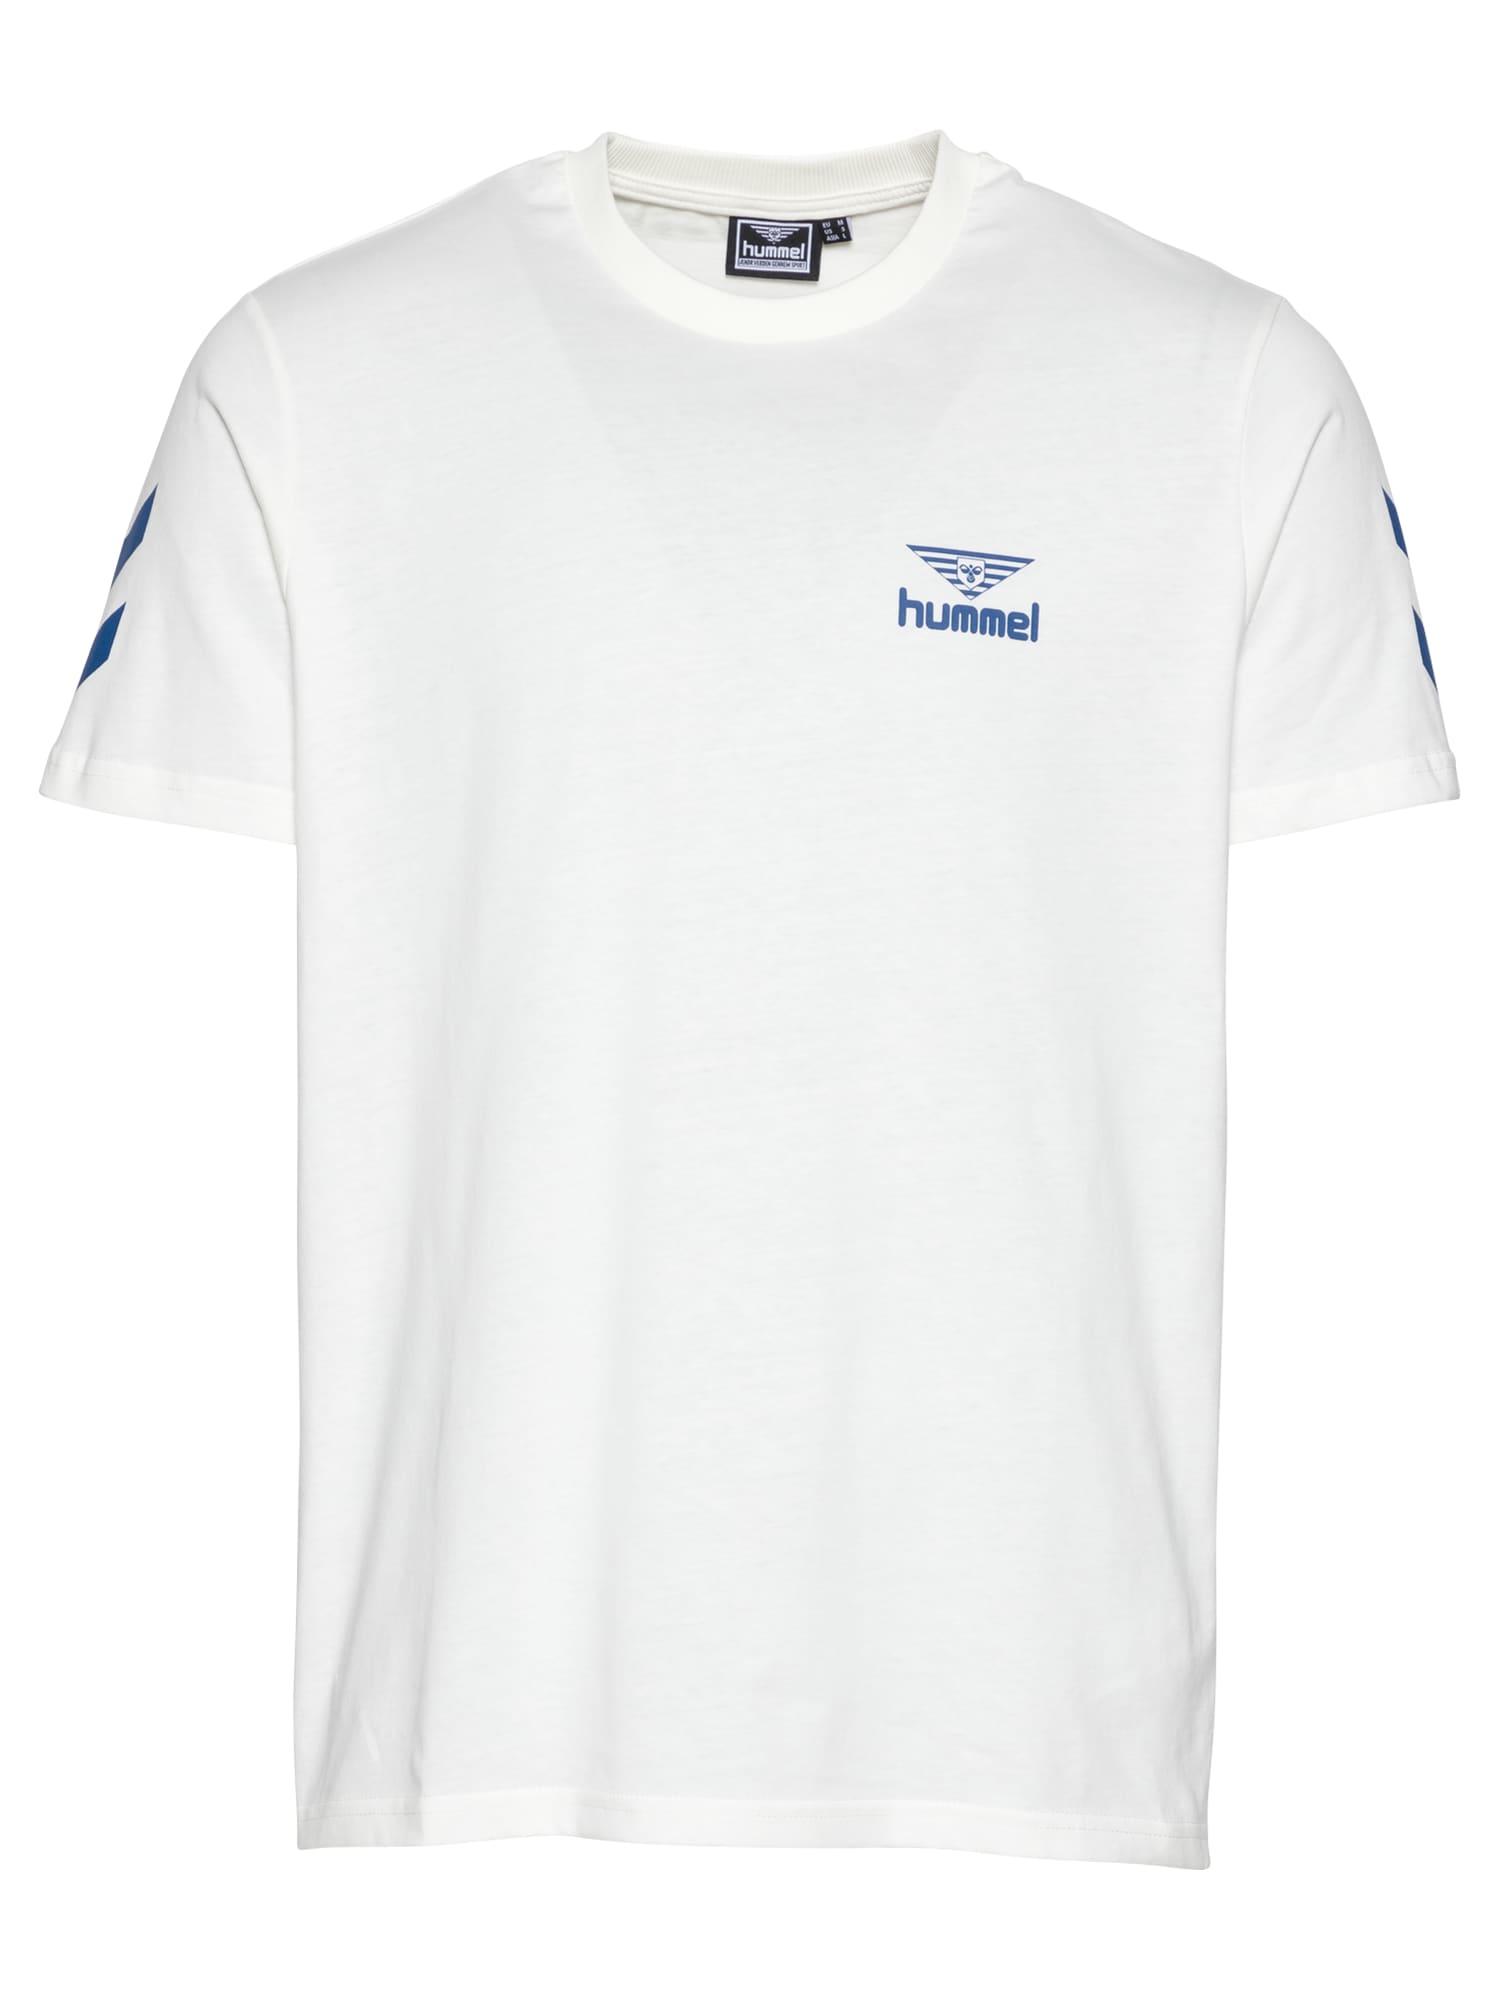 "hummel hive Marškinėliai natūrali balta / sodri mėlyna (""karališka"")"